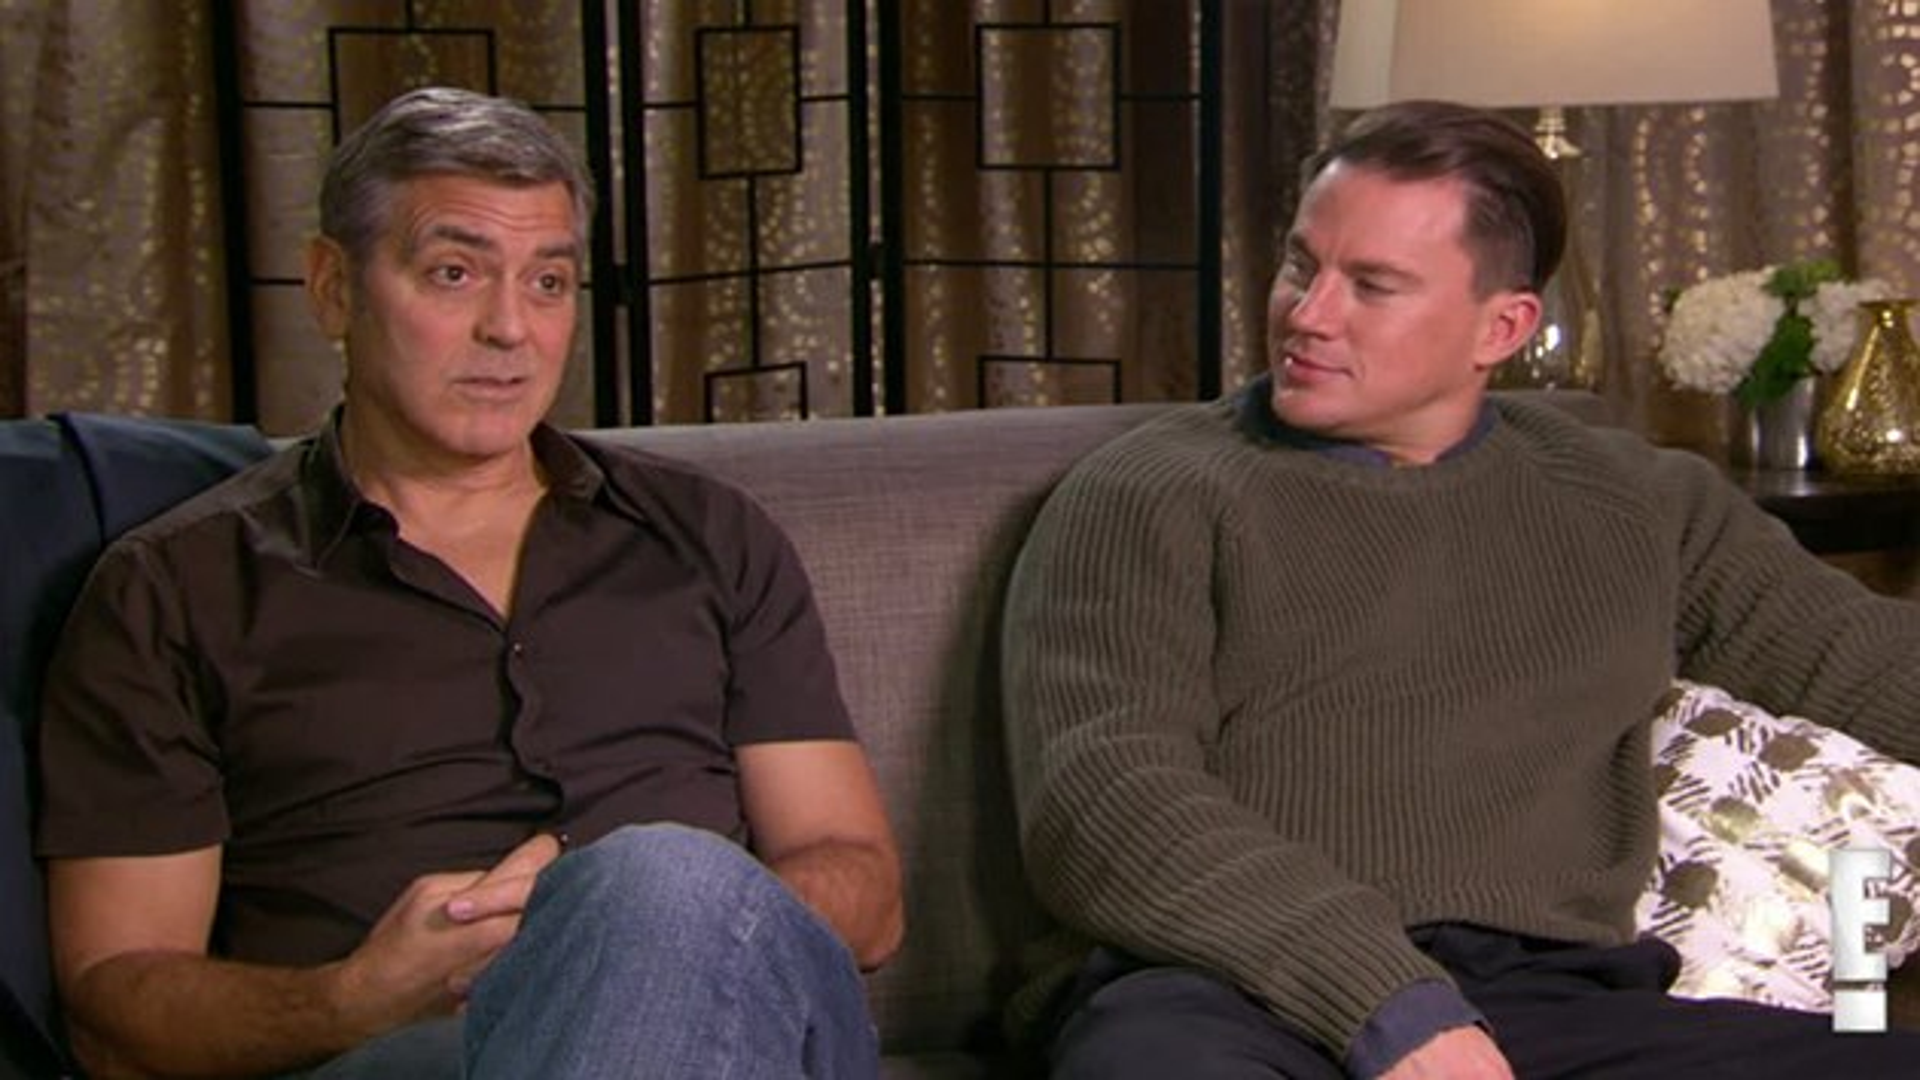 George-Clooney-Channing-Tatum